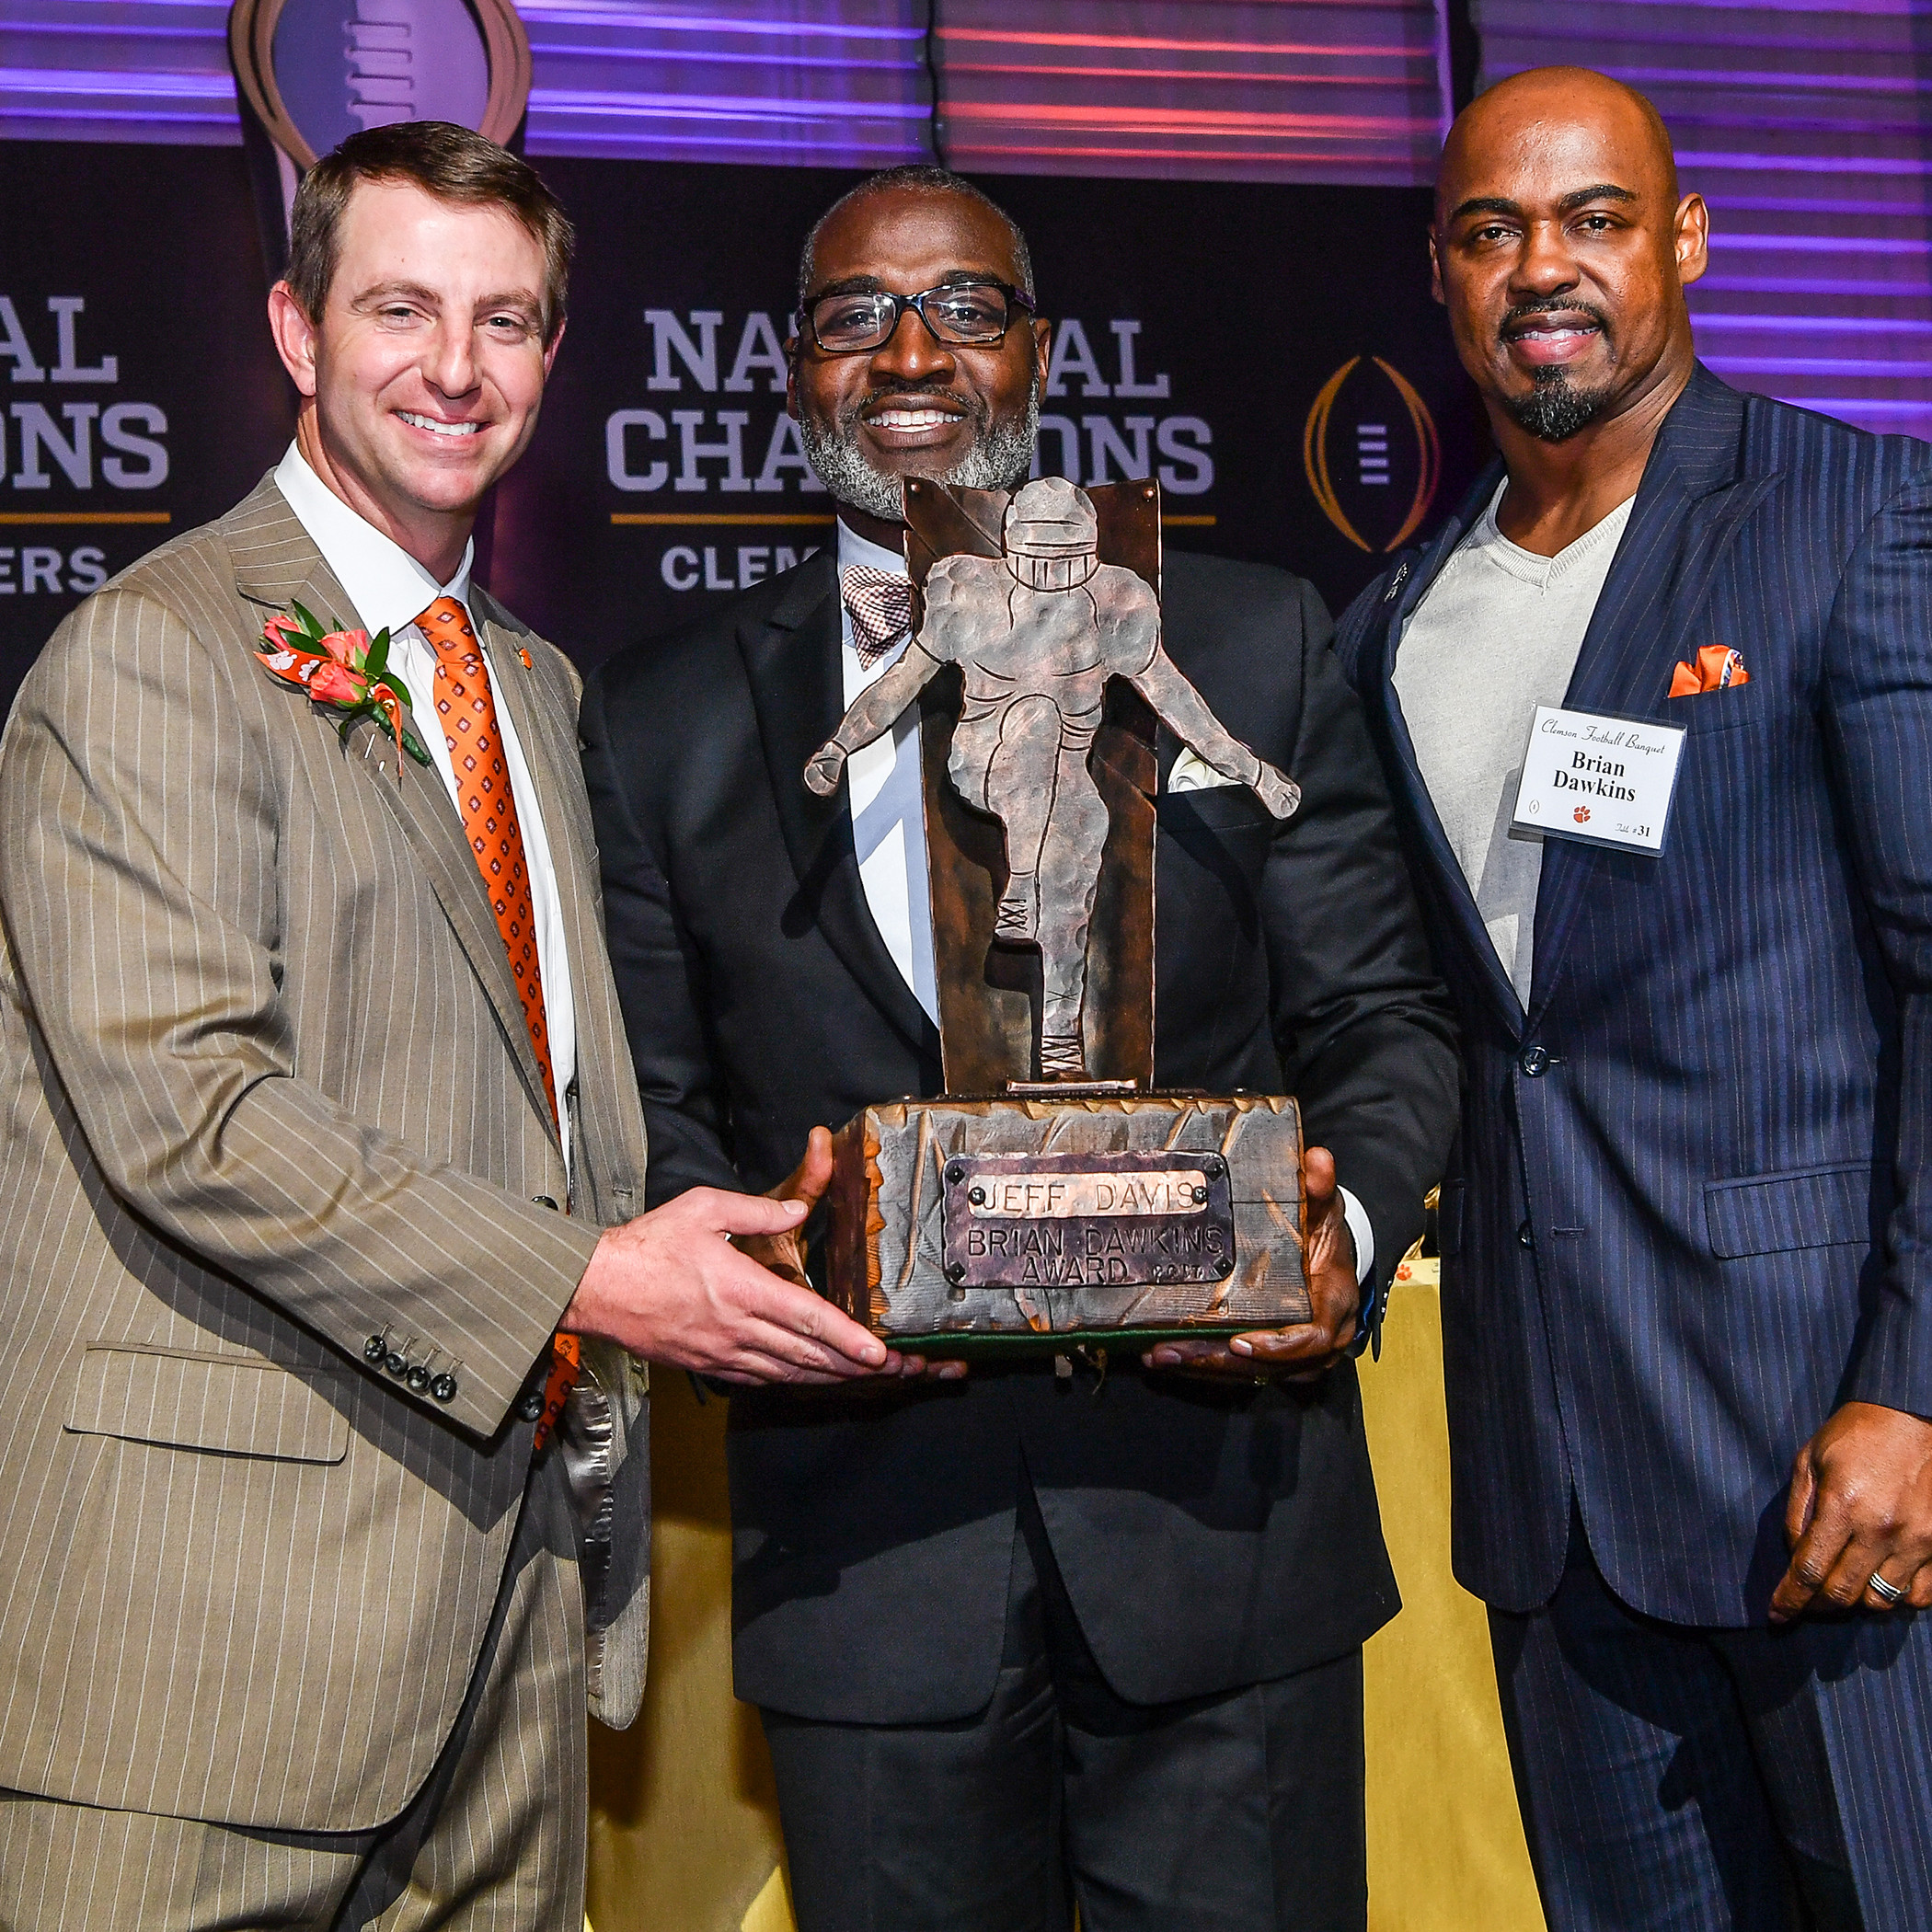 Jeff Davis Receives Award